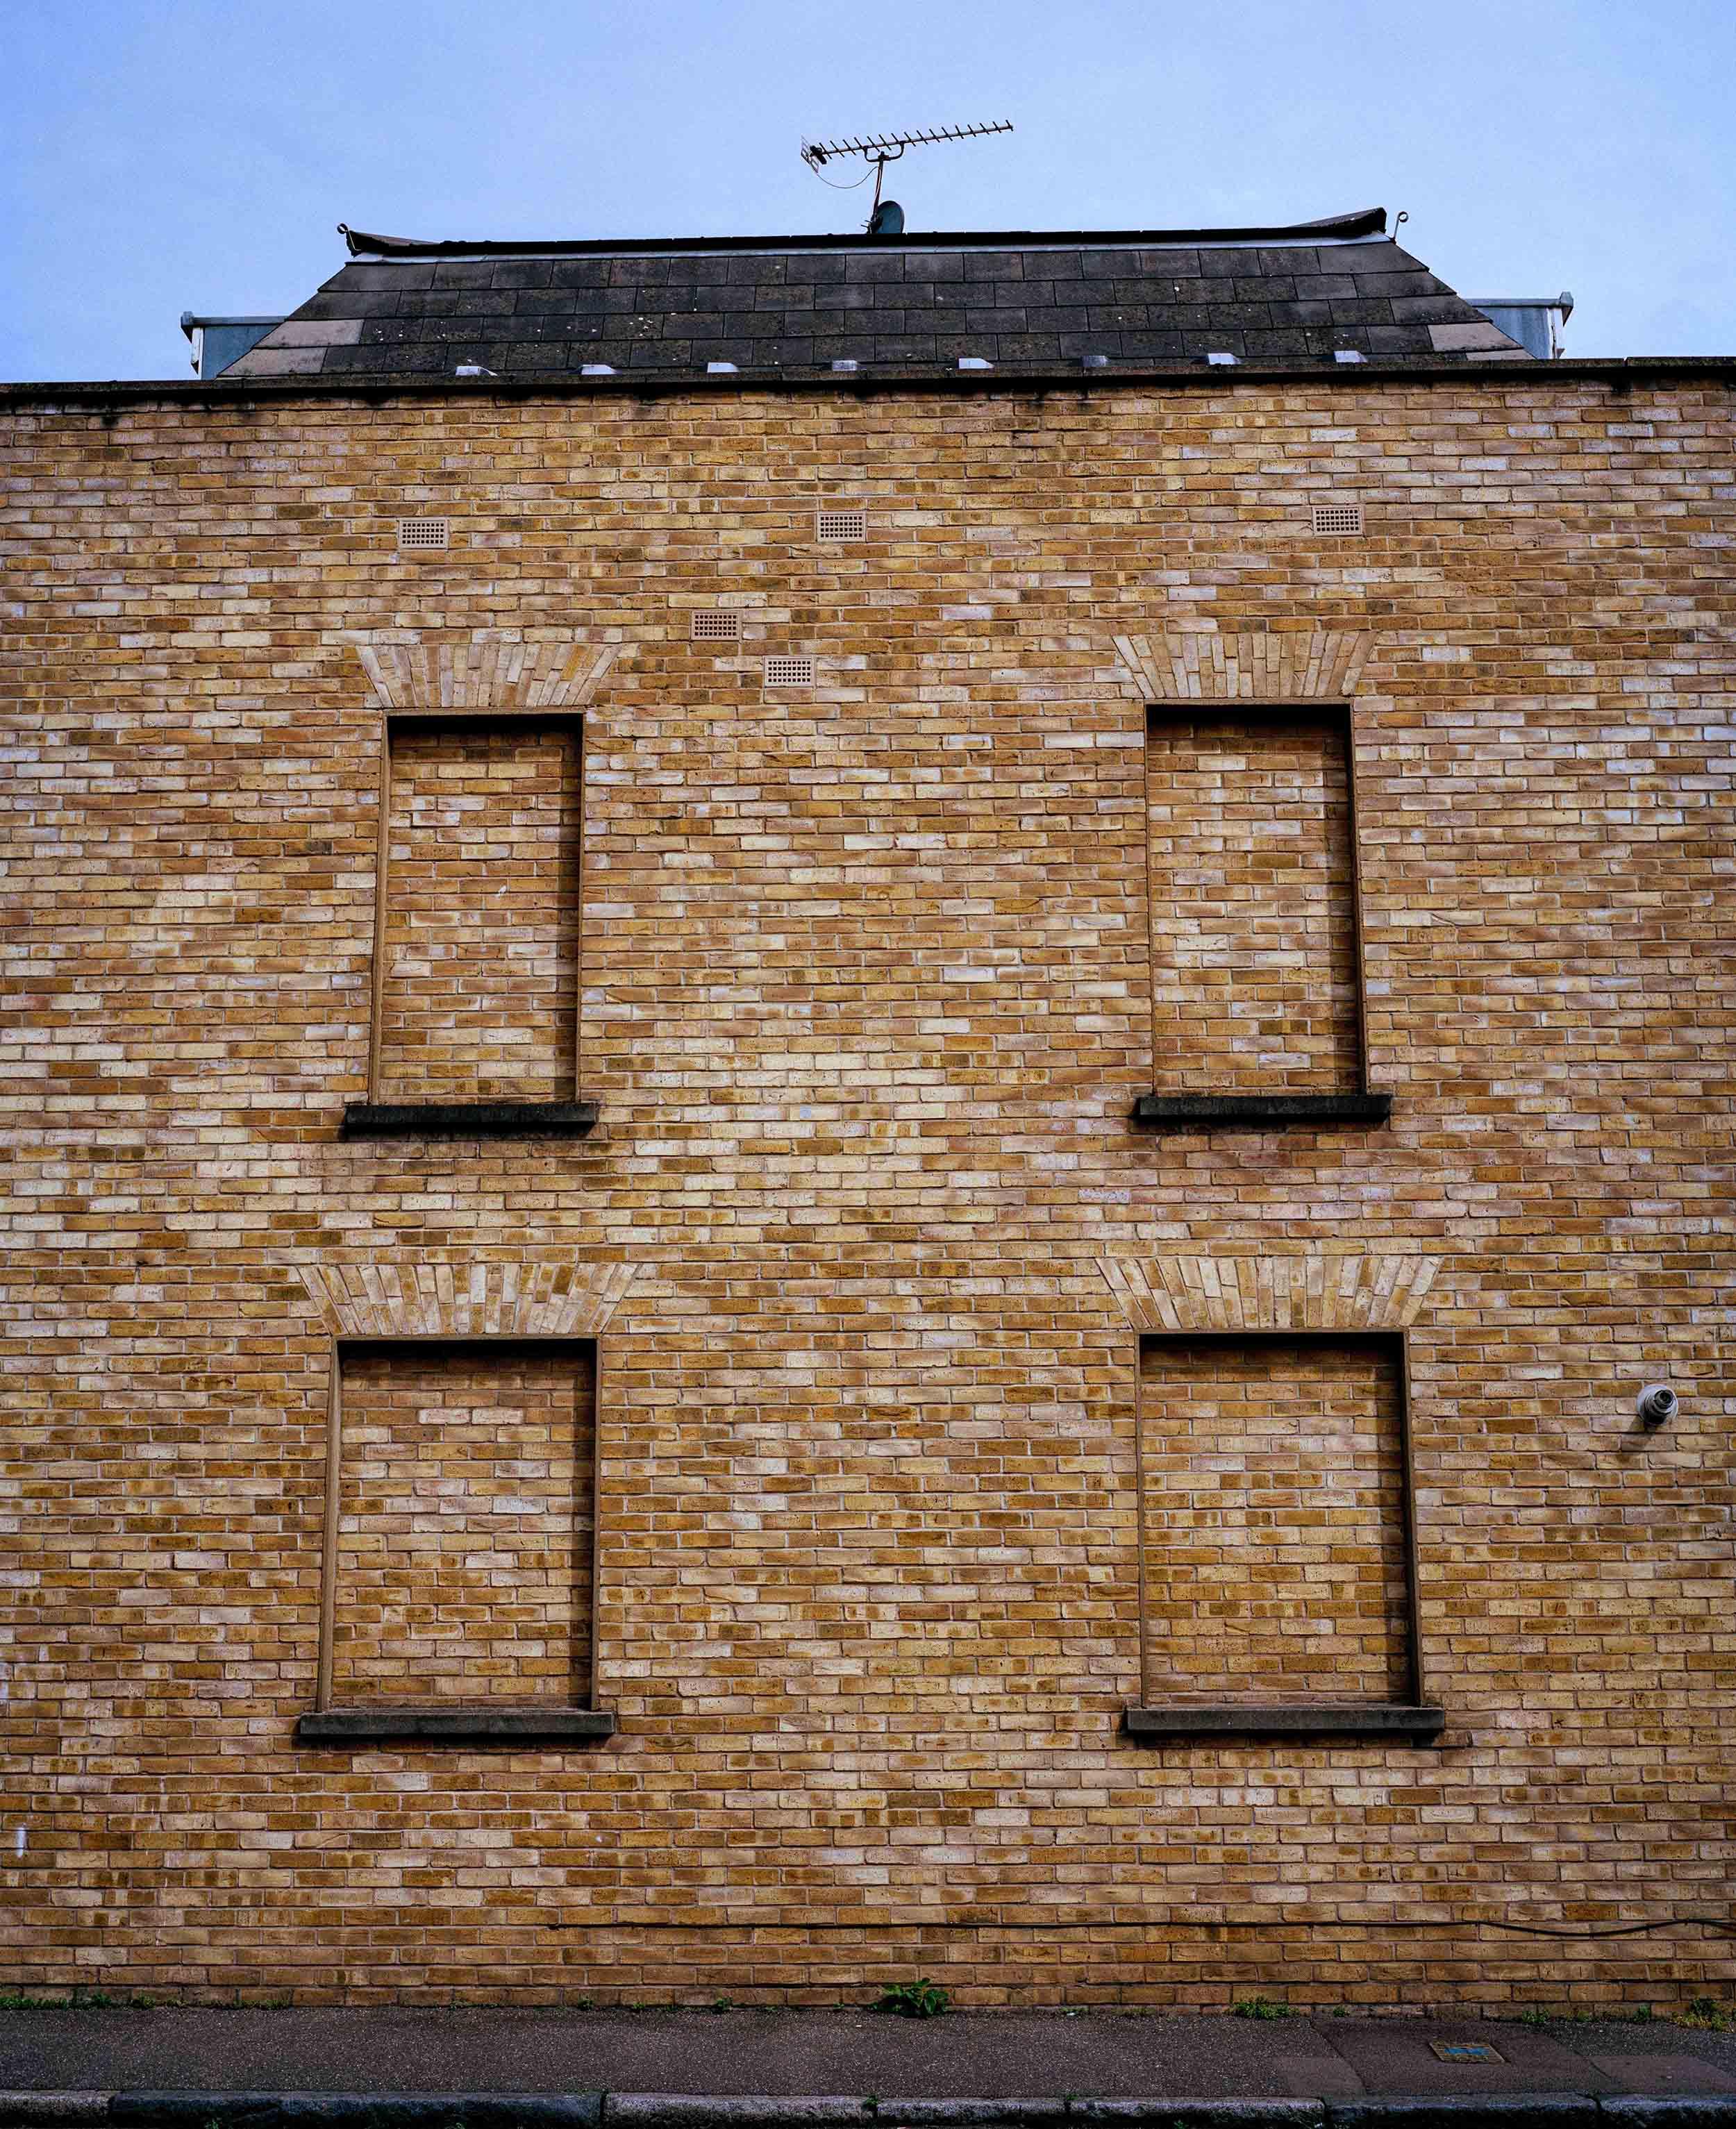 17-blighty-england-london-sam-gregg-photography.jpg